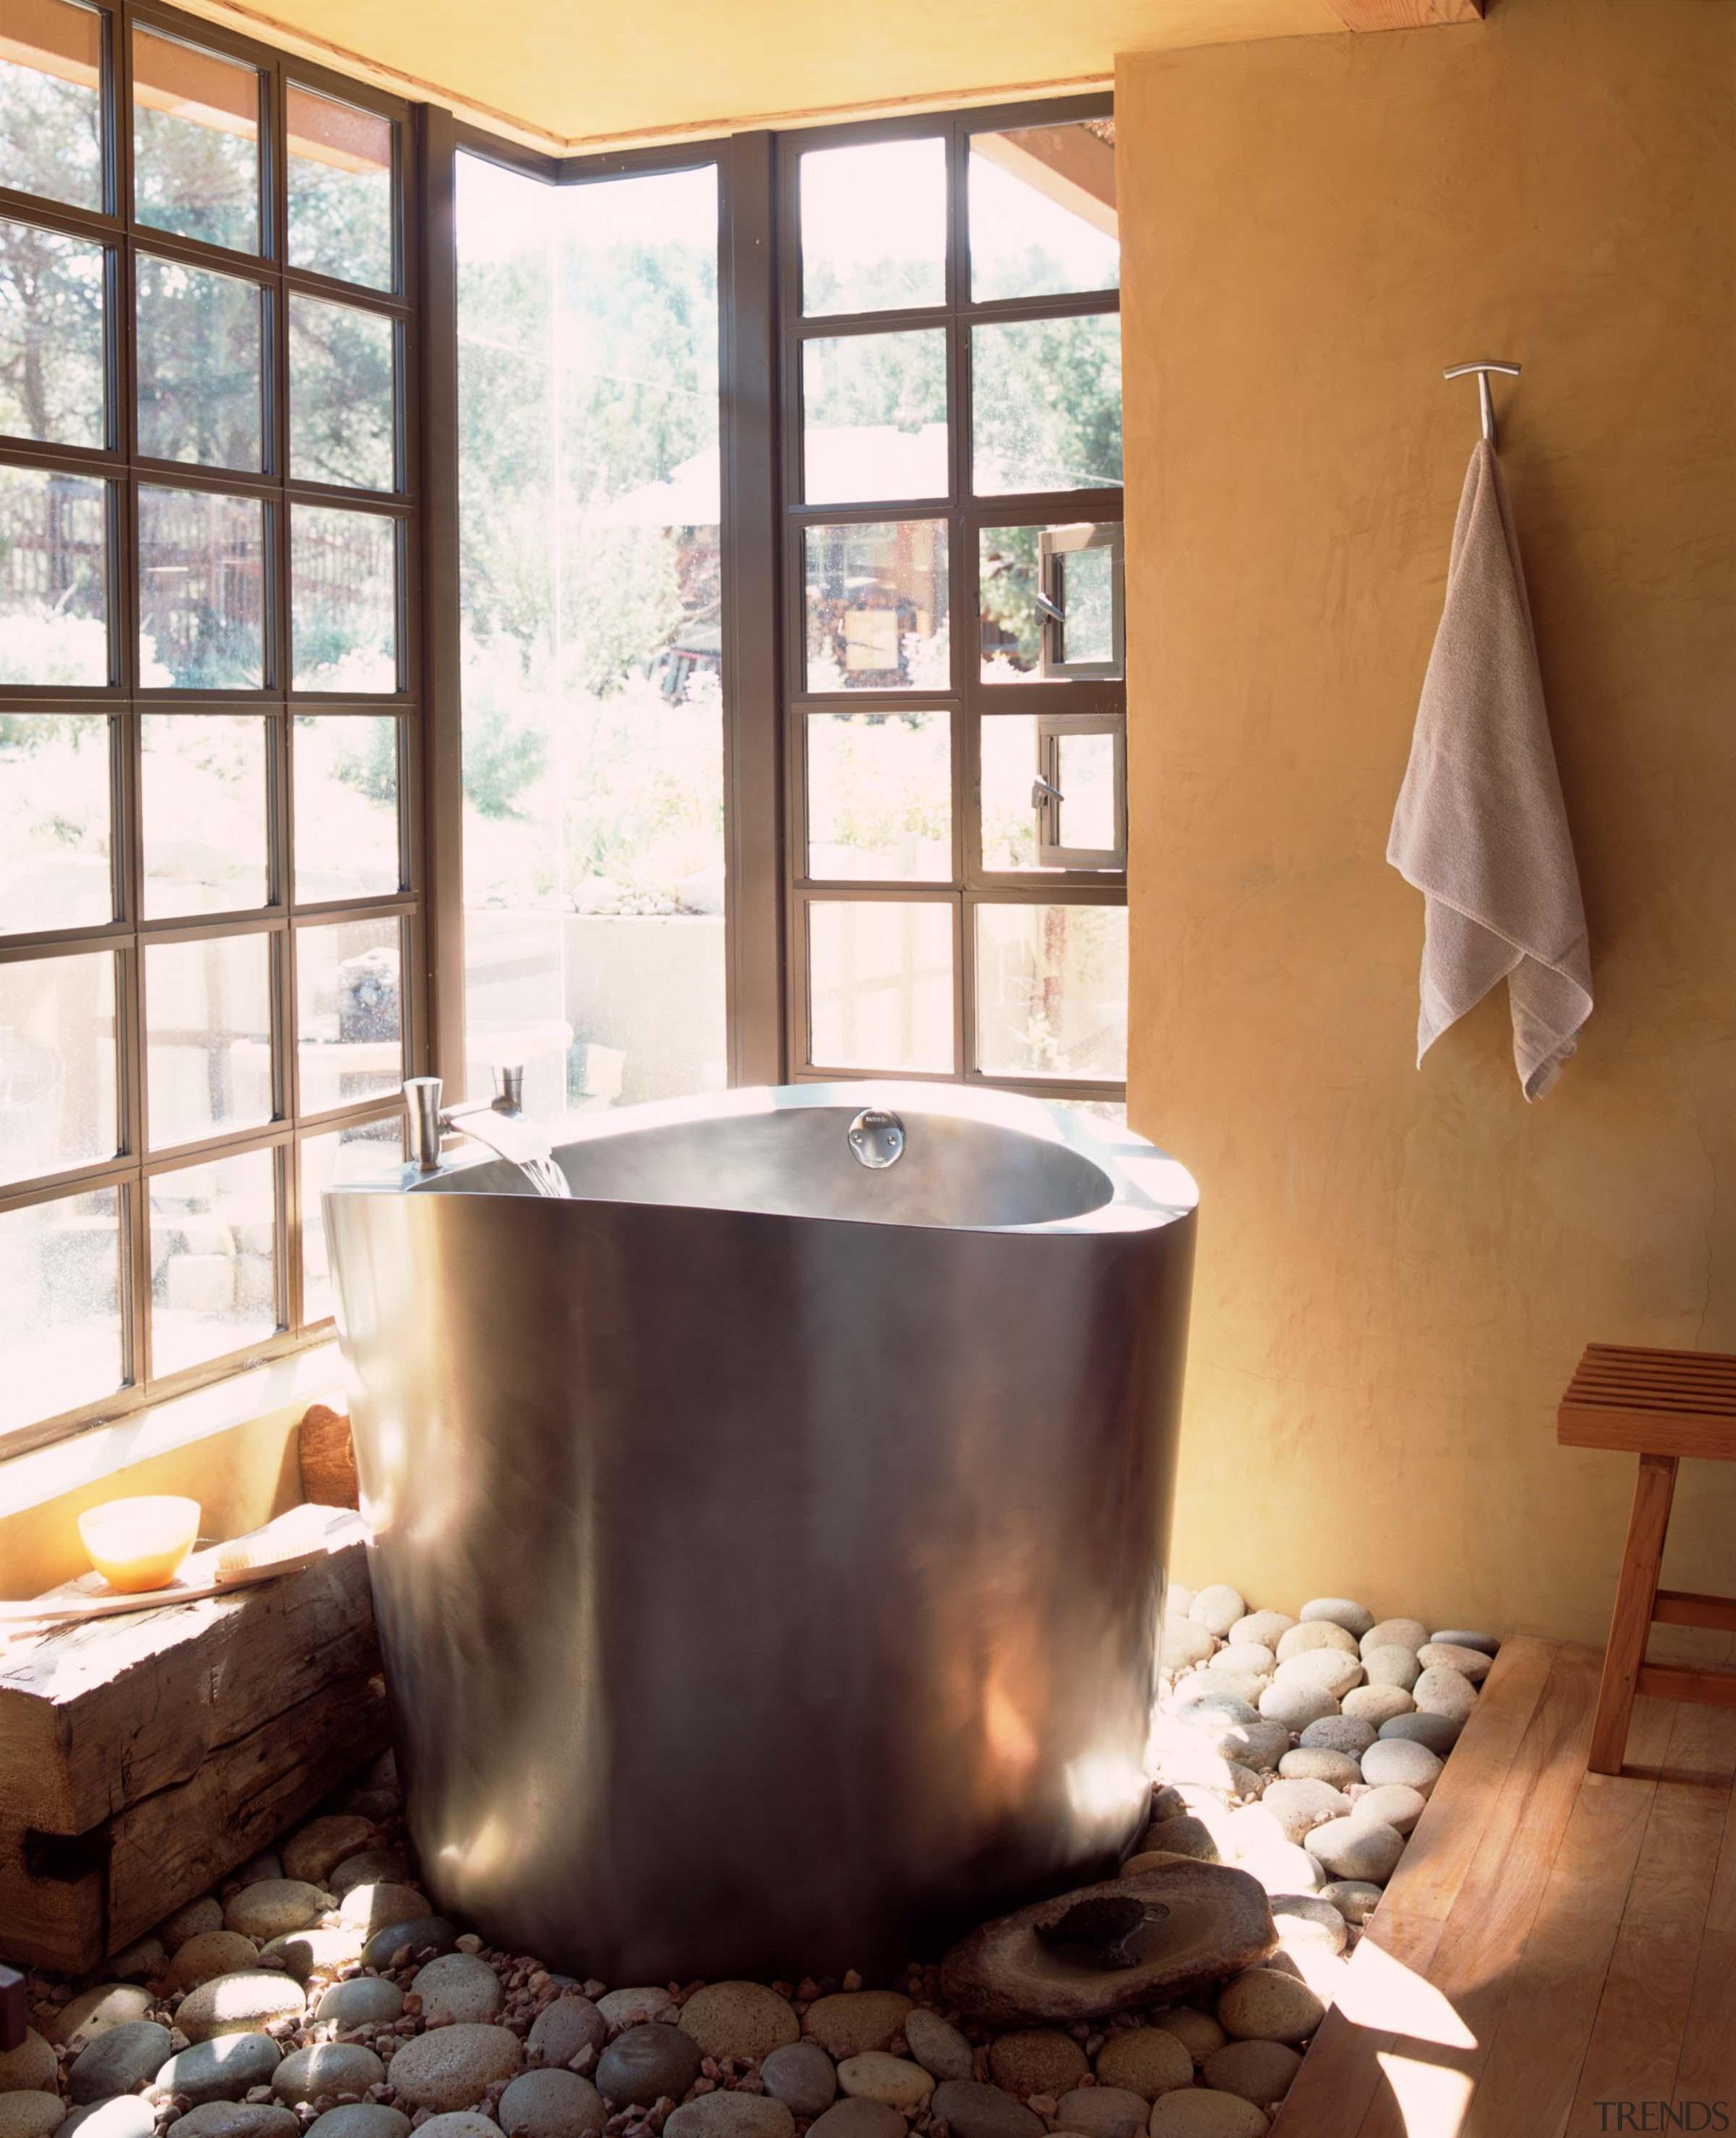 Diamond Spas modern version of the Japanese Ofuro bathroom, bathtub, interior design, plumbing fixture, room, sink, white